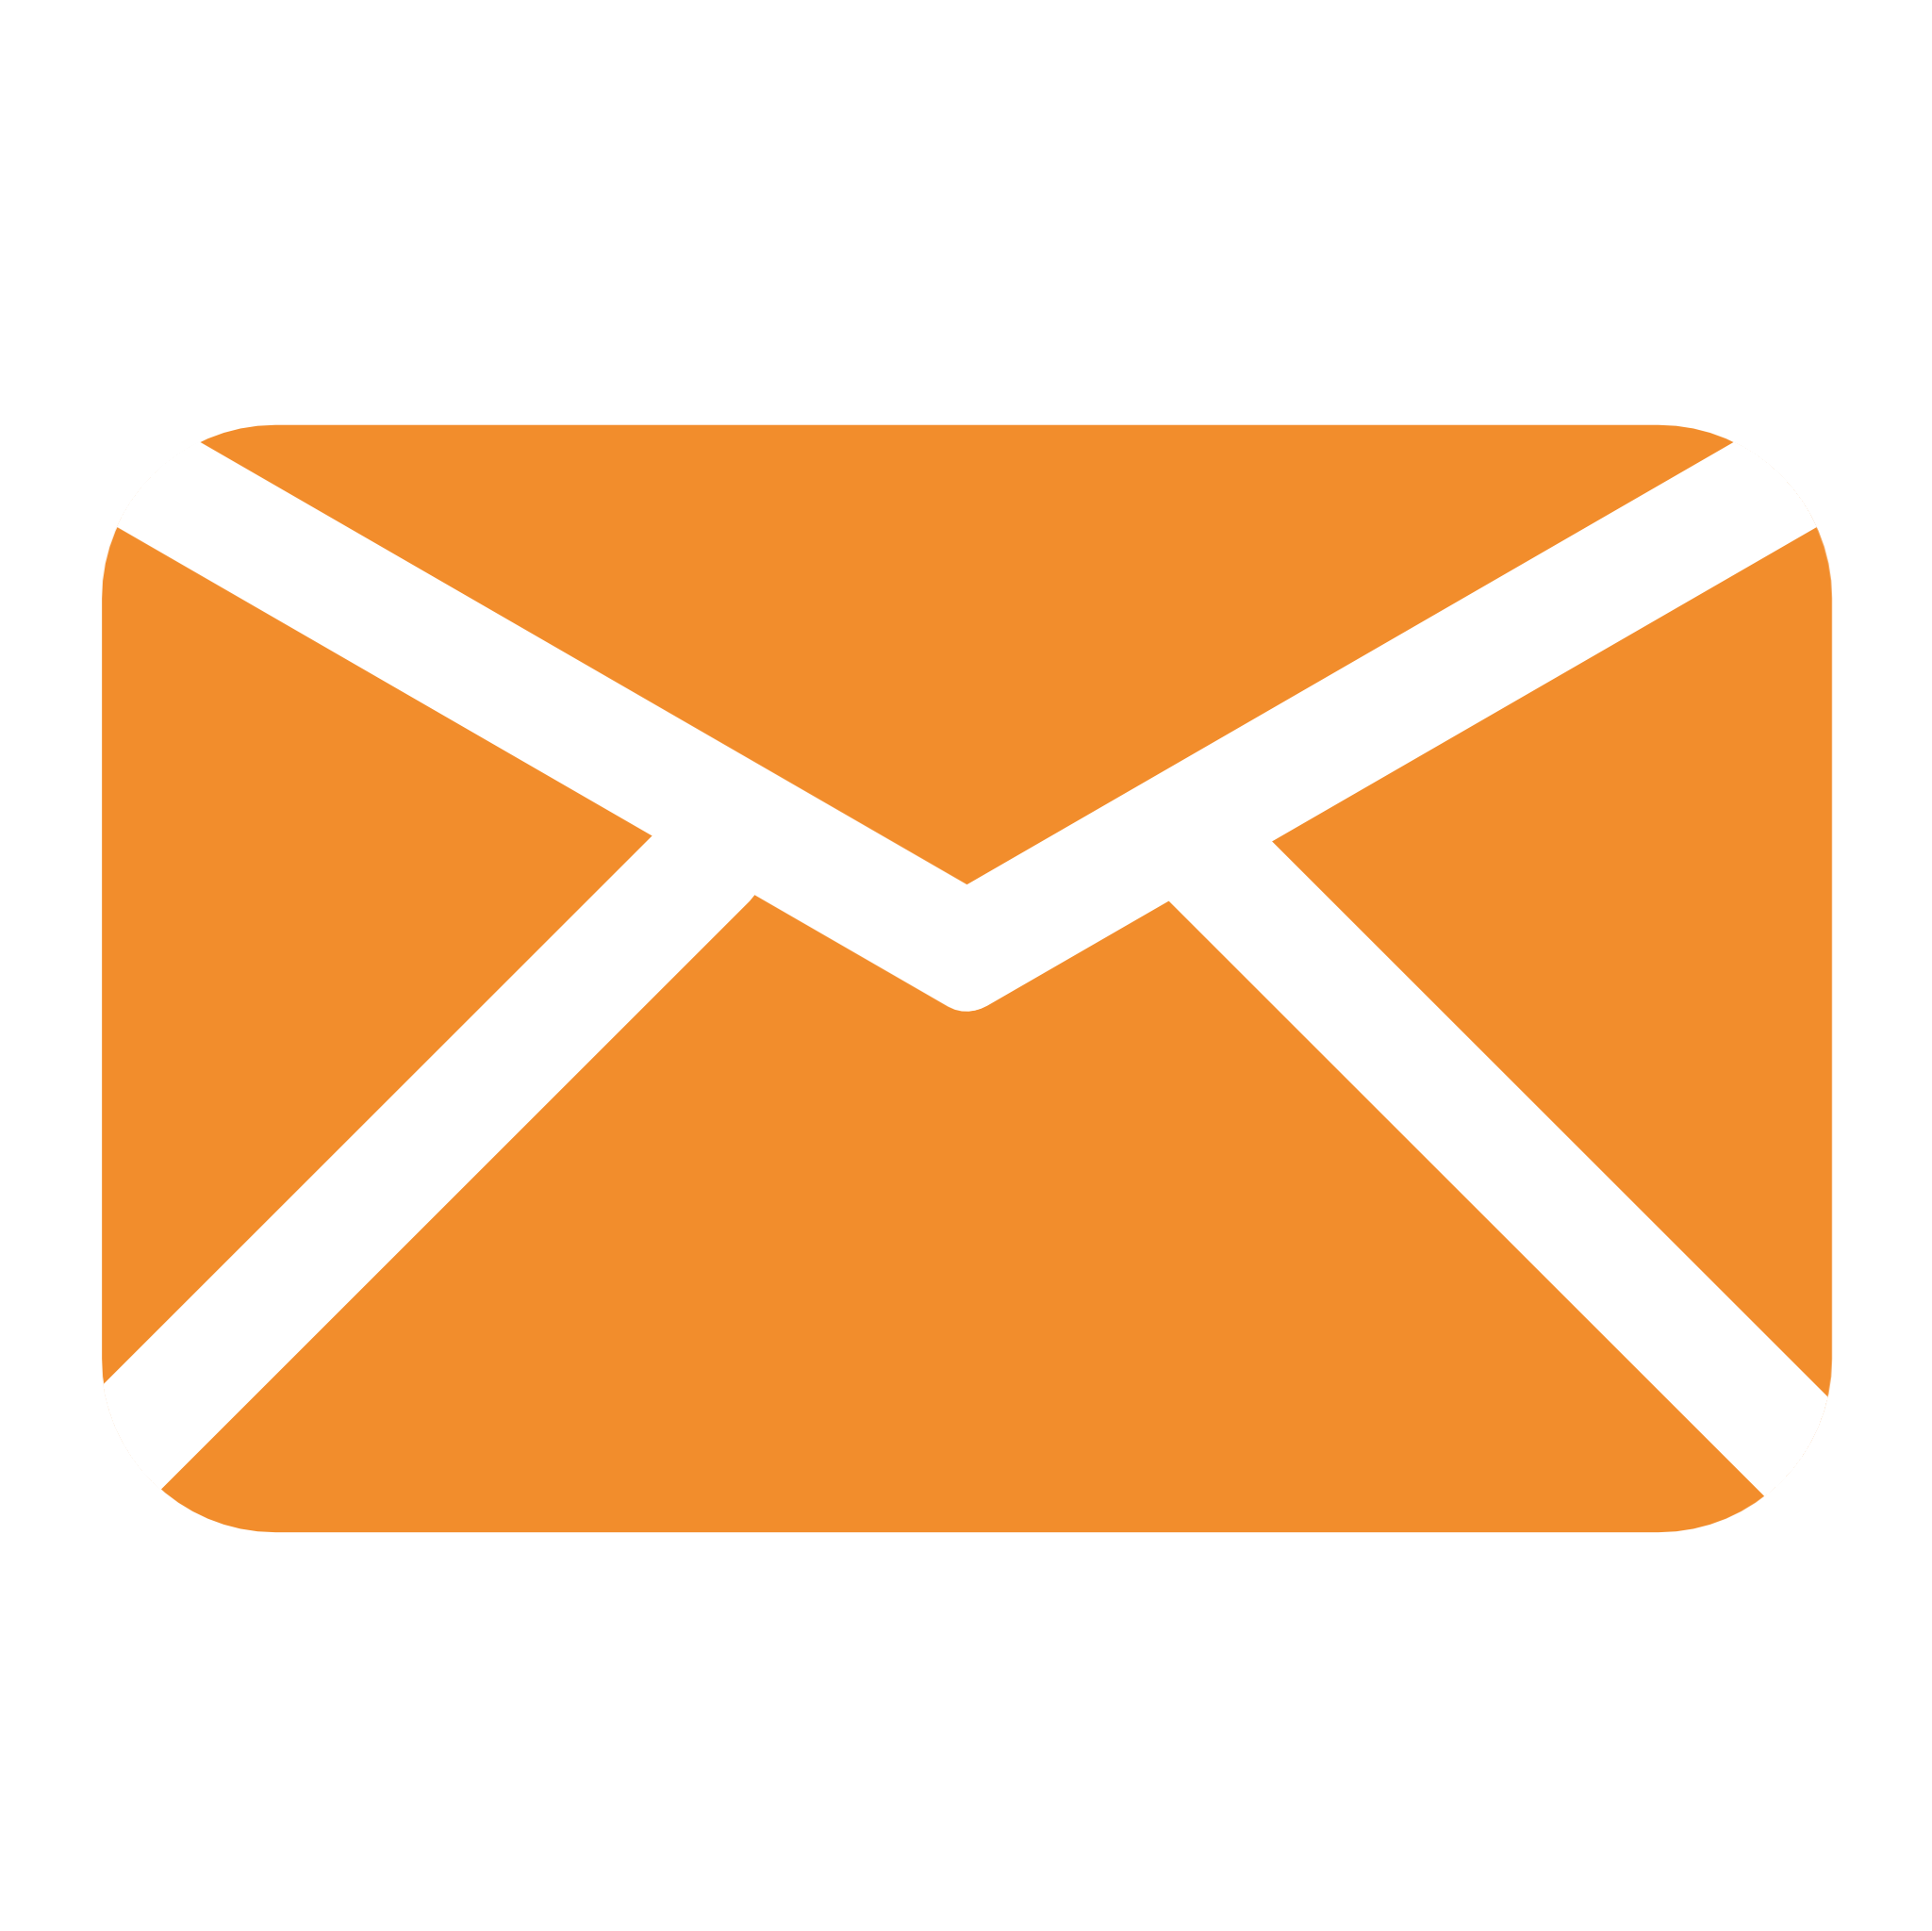 orange envelop icon